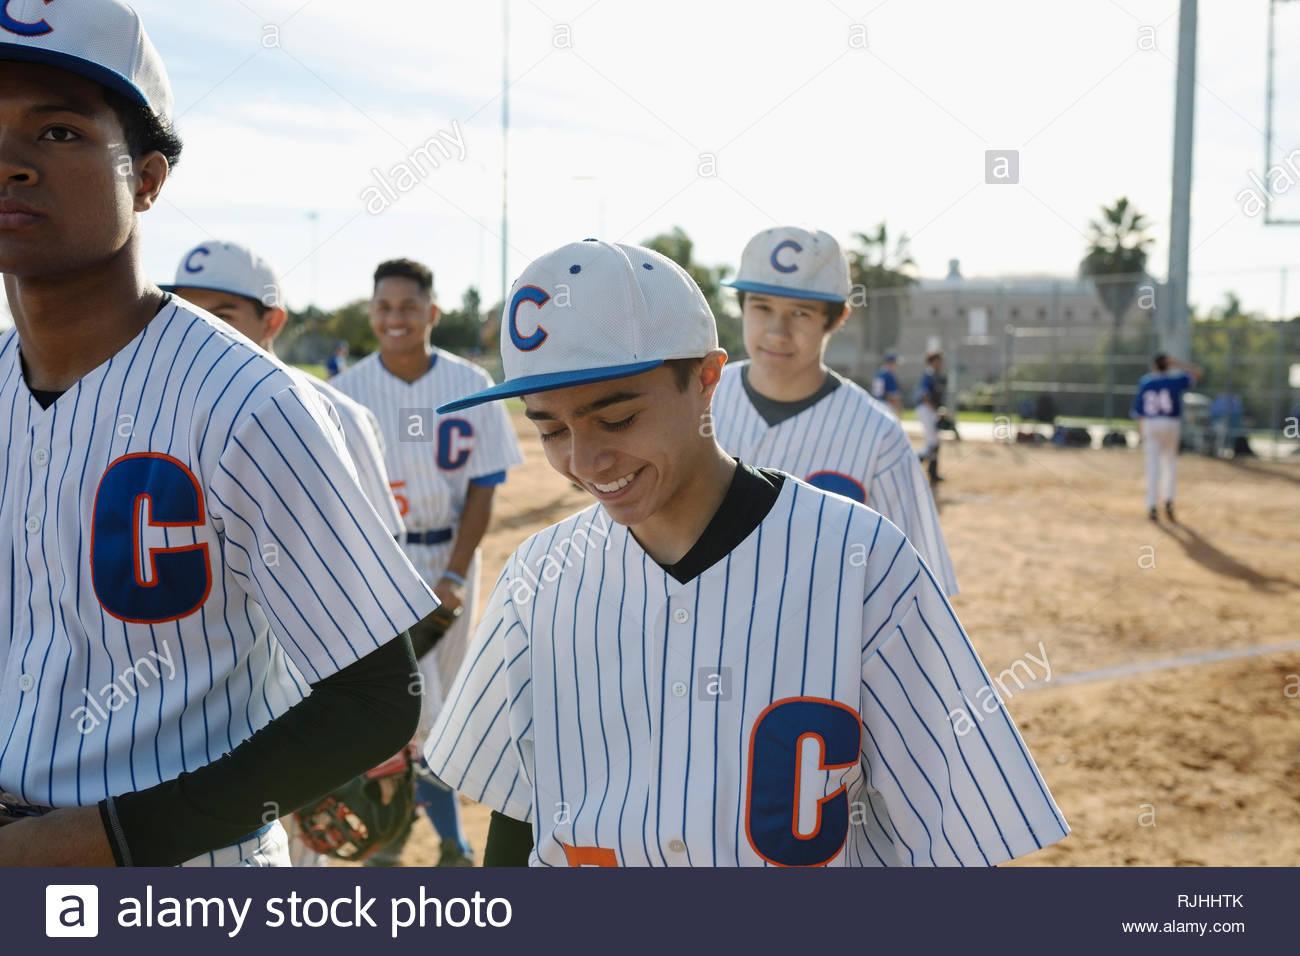 Smiling Latinx baseball player walking off field - Stock Image